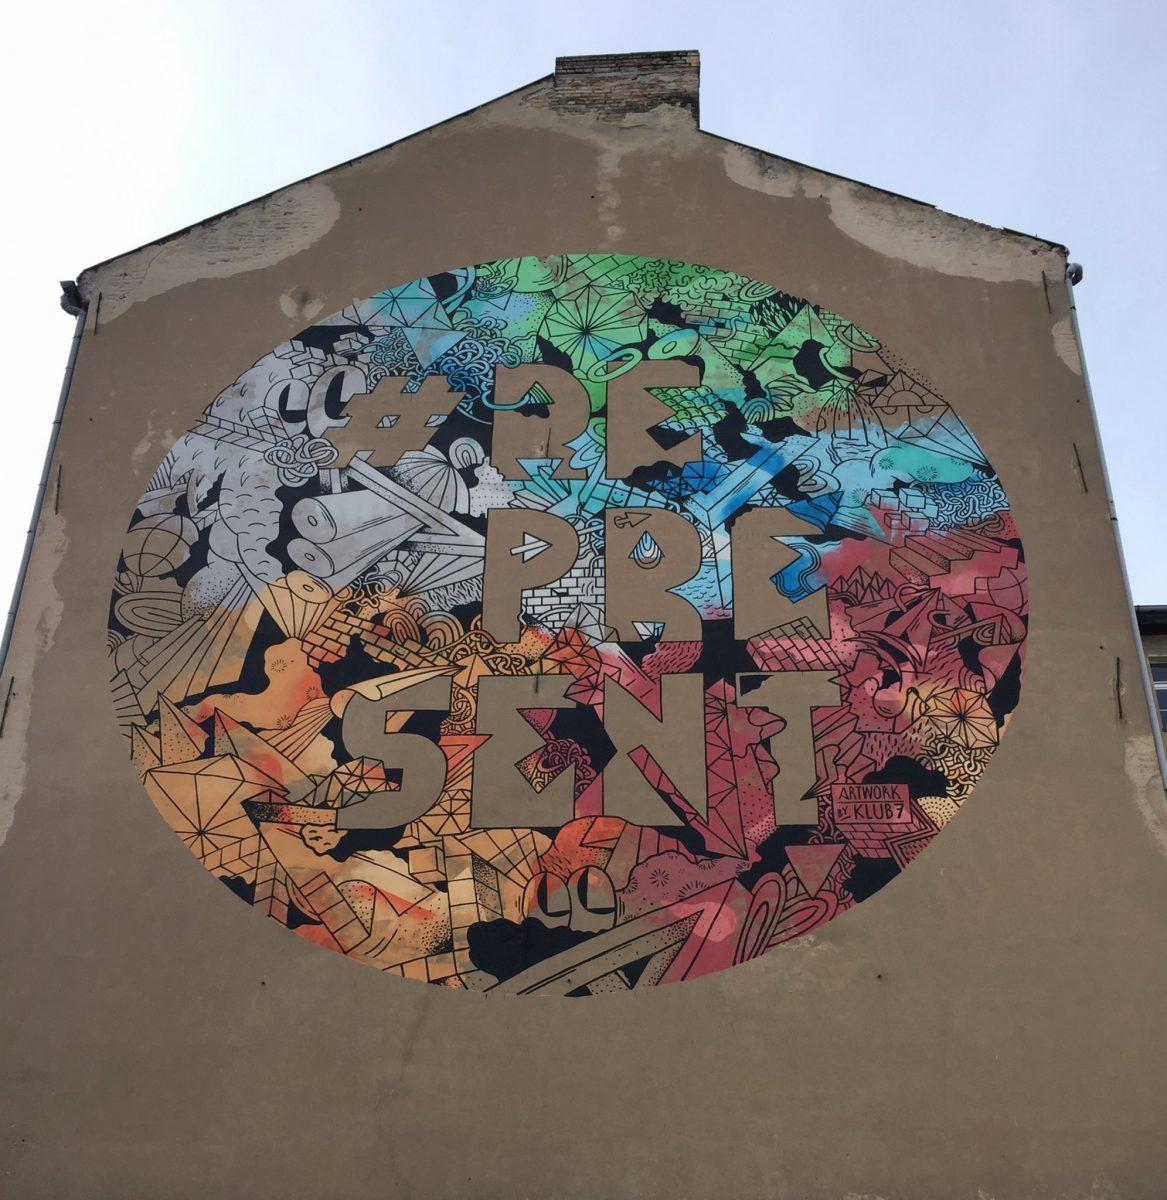 Berlin, Street Art and Graffiti – Series I – The begining.